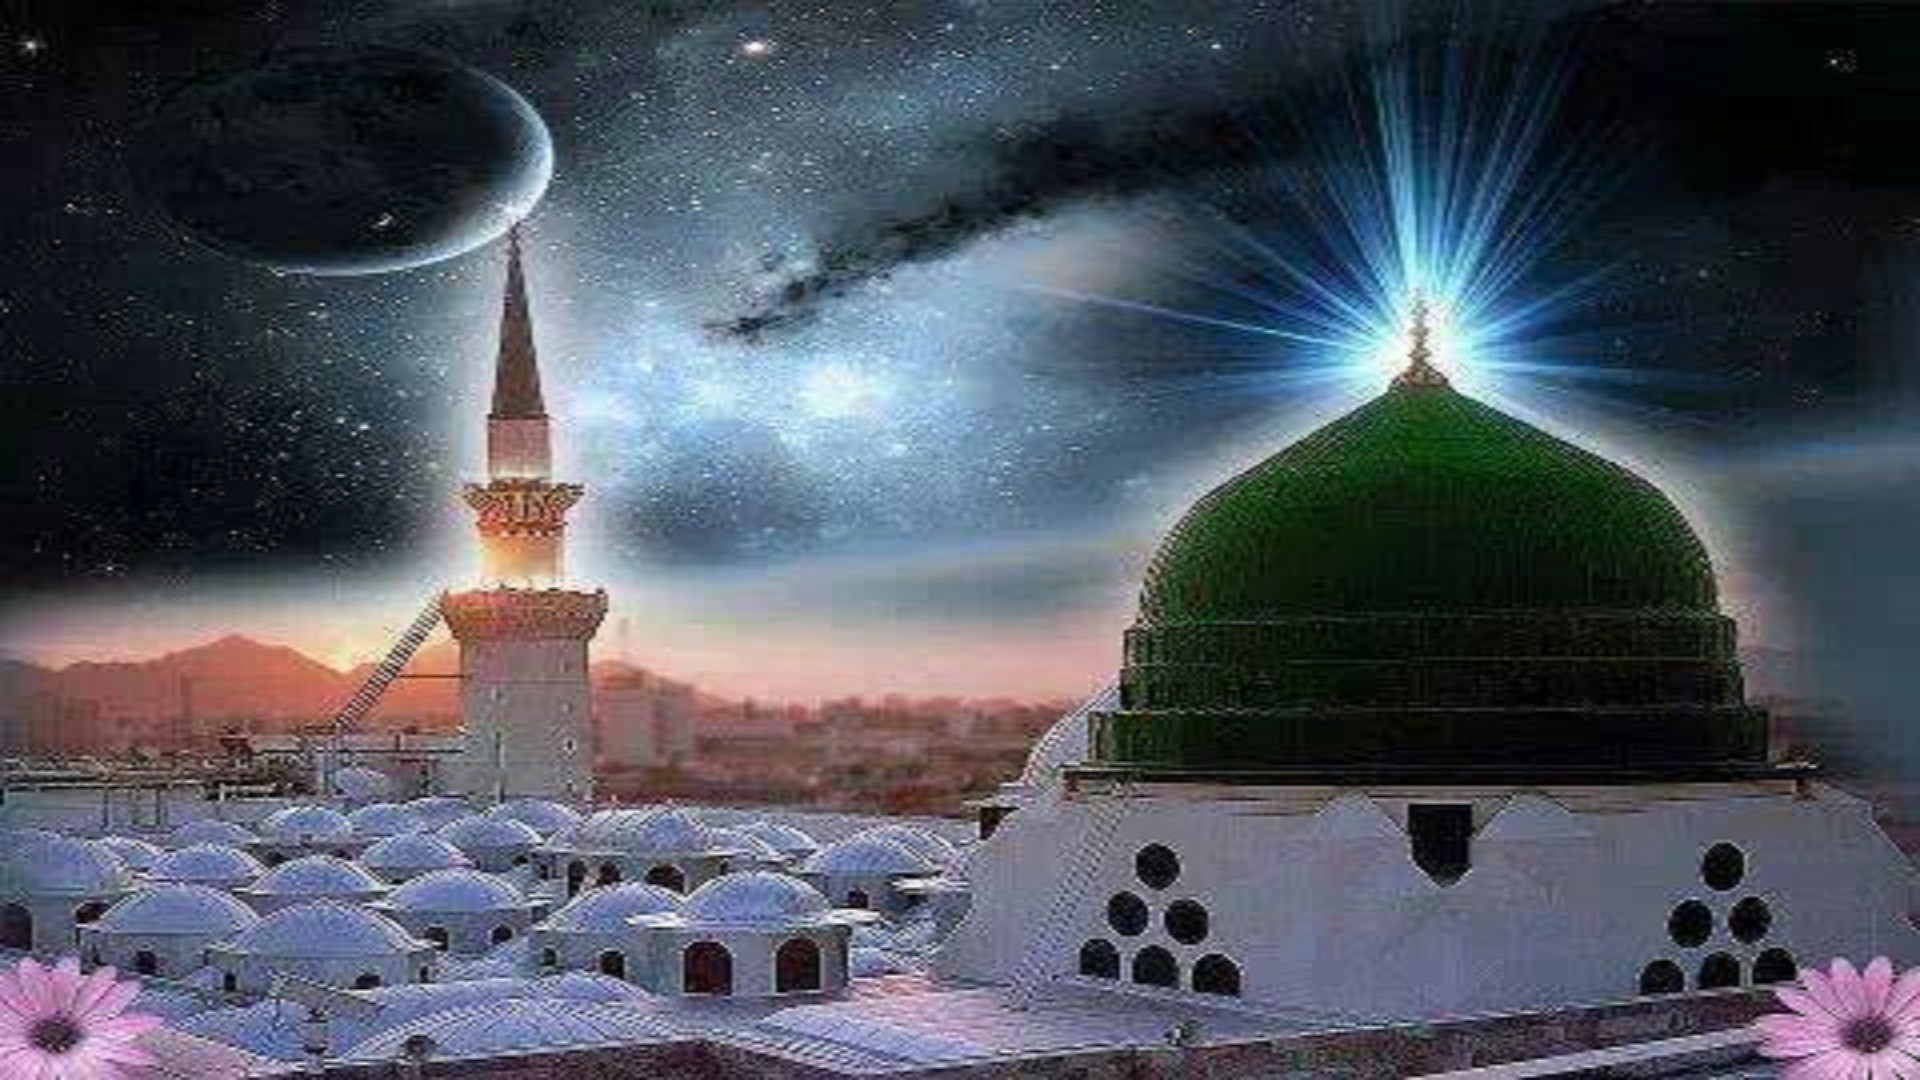 Mecca HD Wallpaper (70+ images)